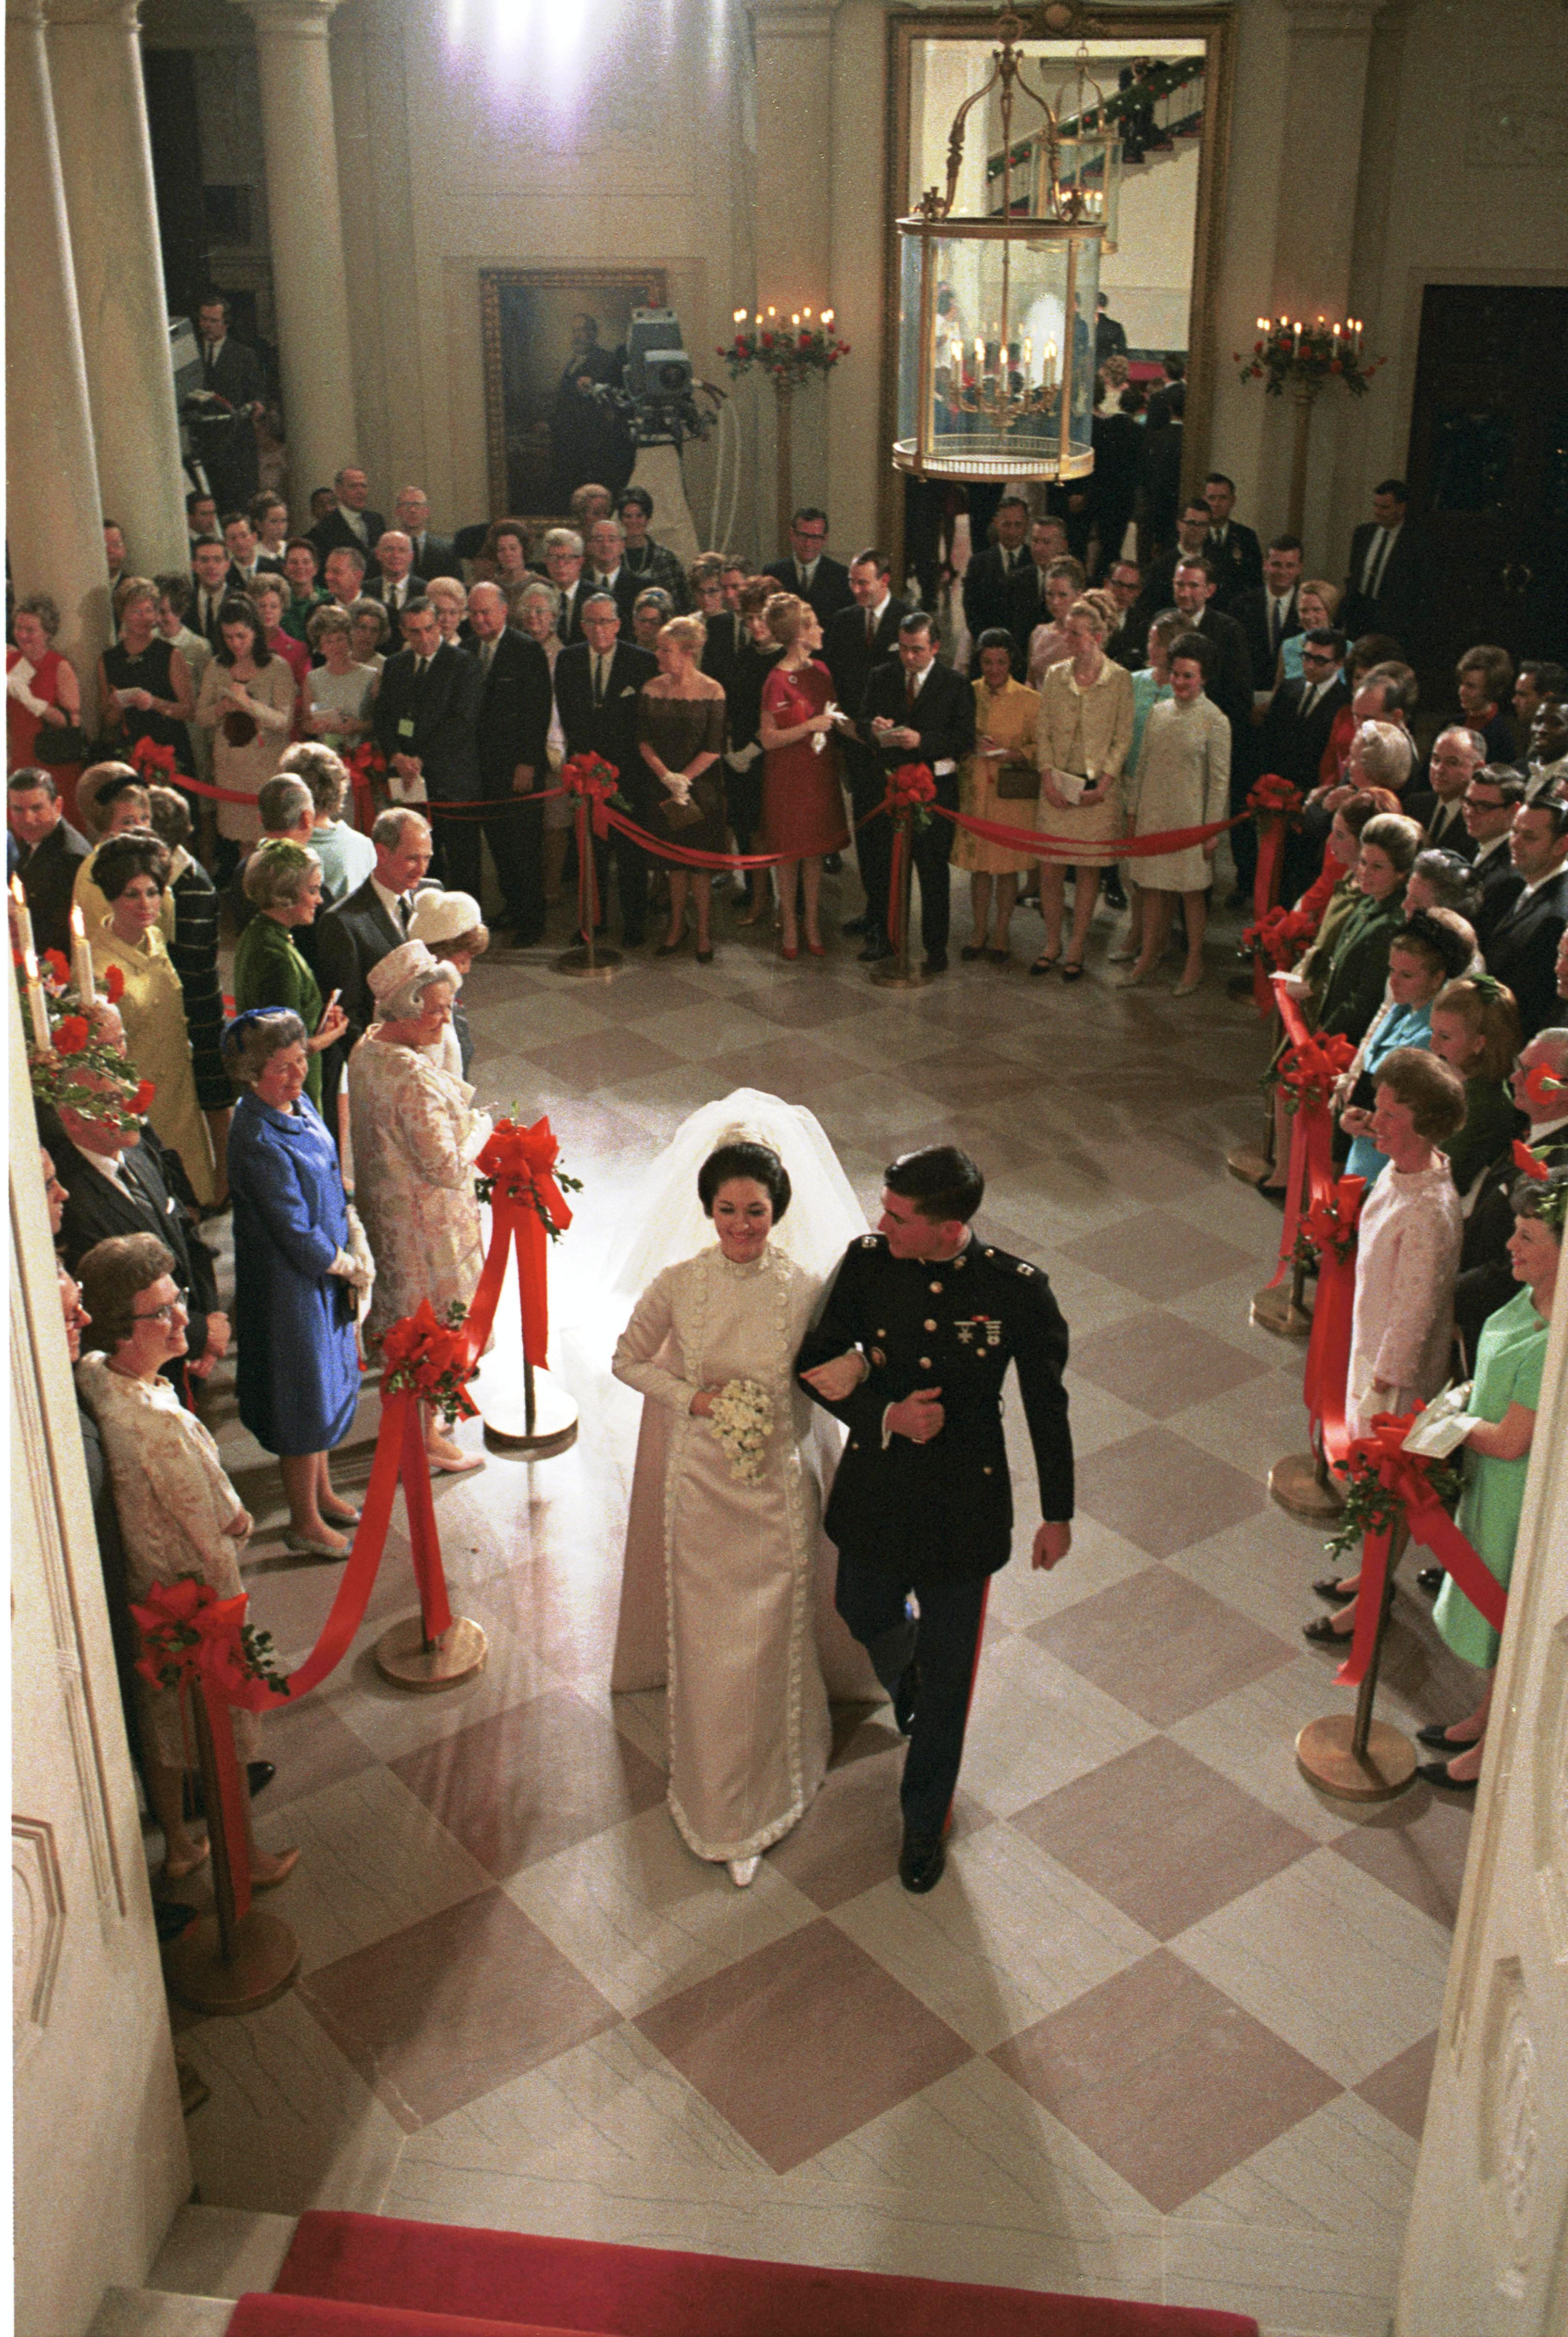 White House Weddings Luci Amp Lynda Johnson Noltes Bridal